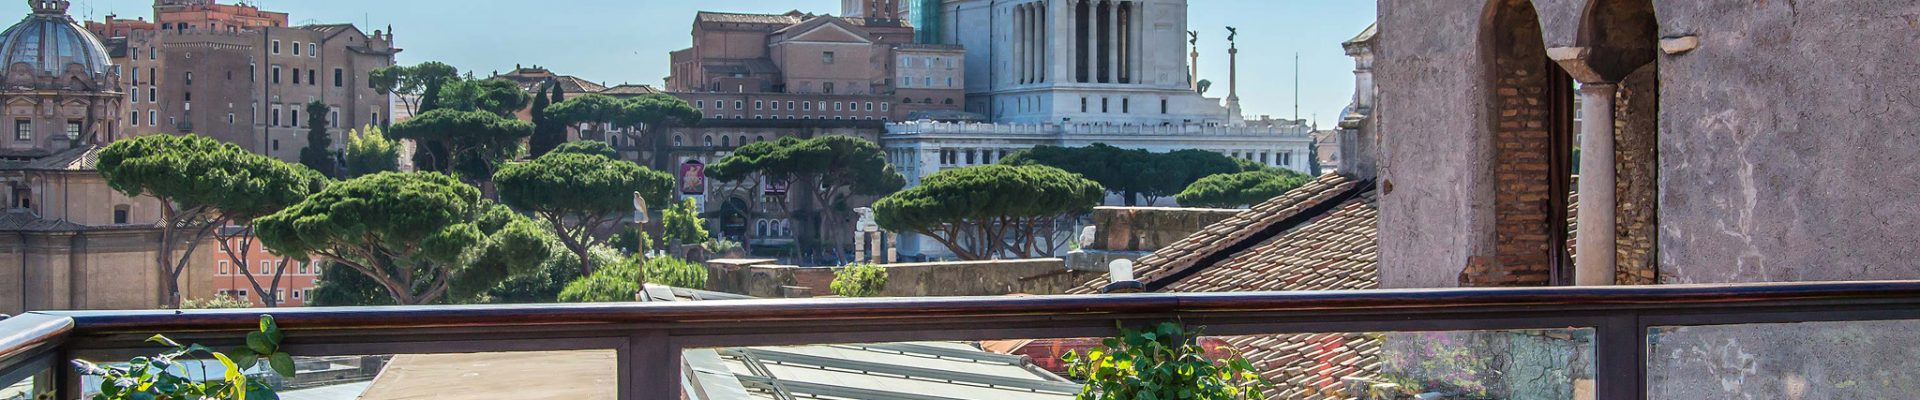 roof-garden-hotel-forum-american-bar-04